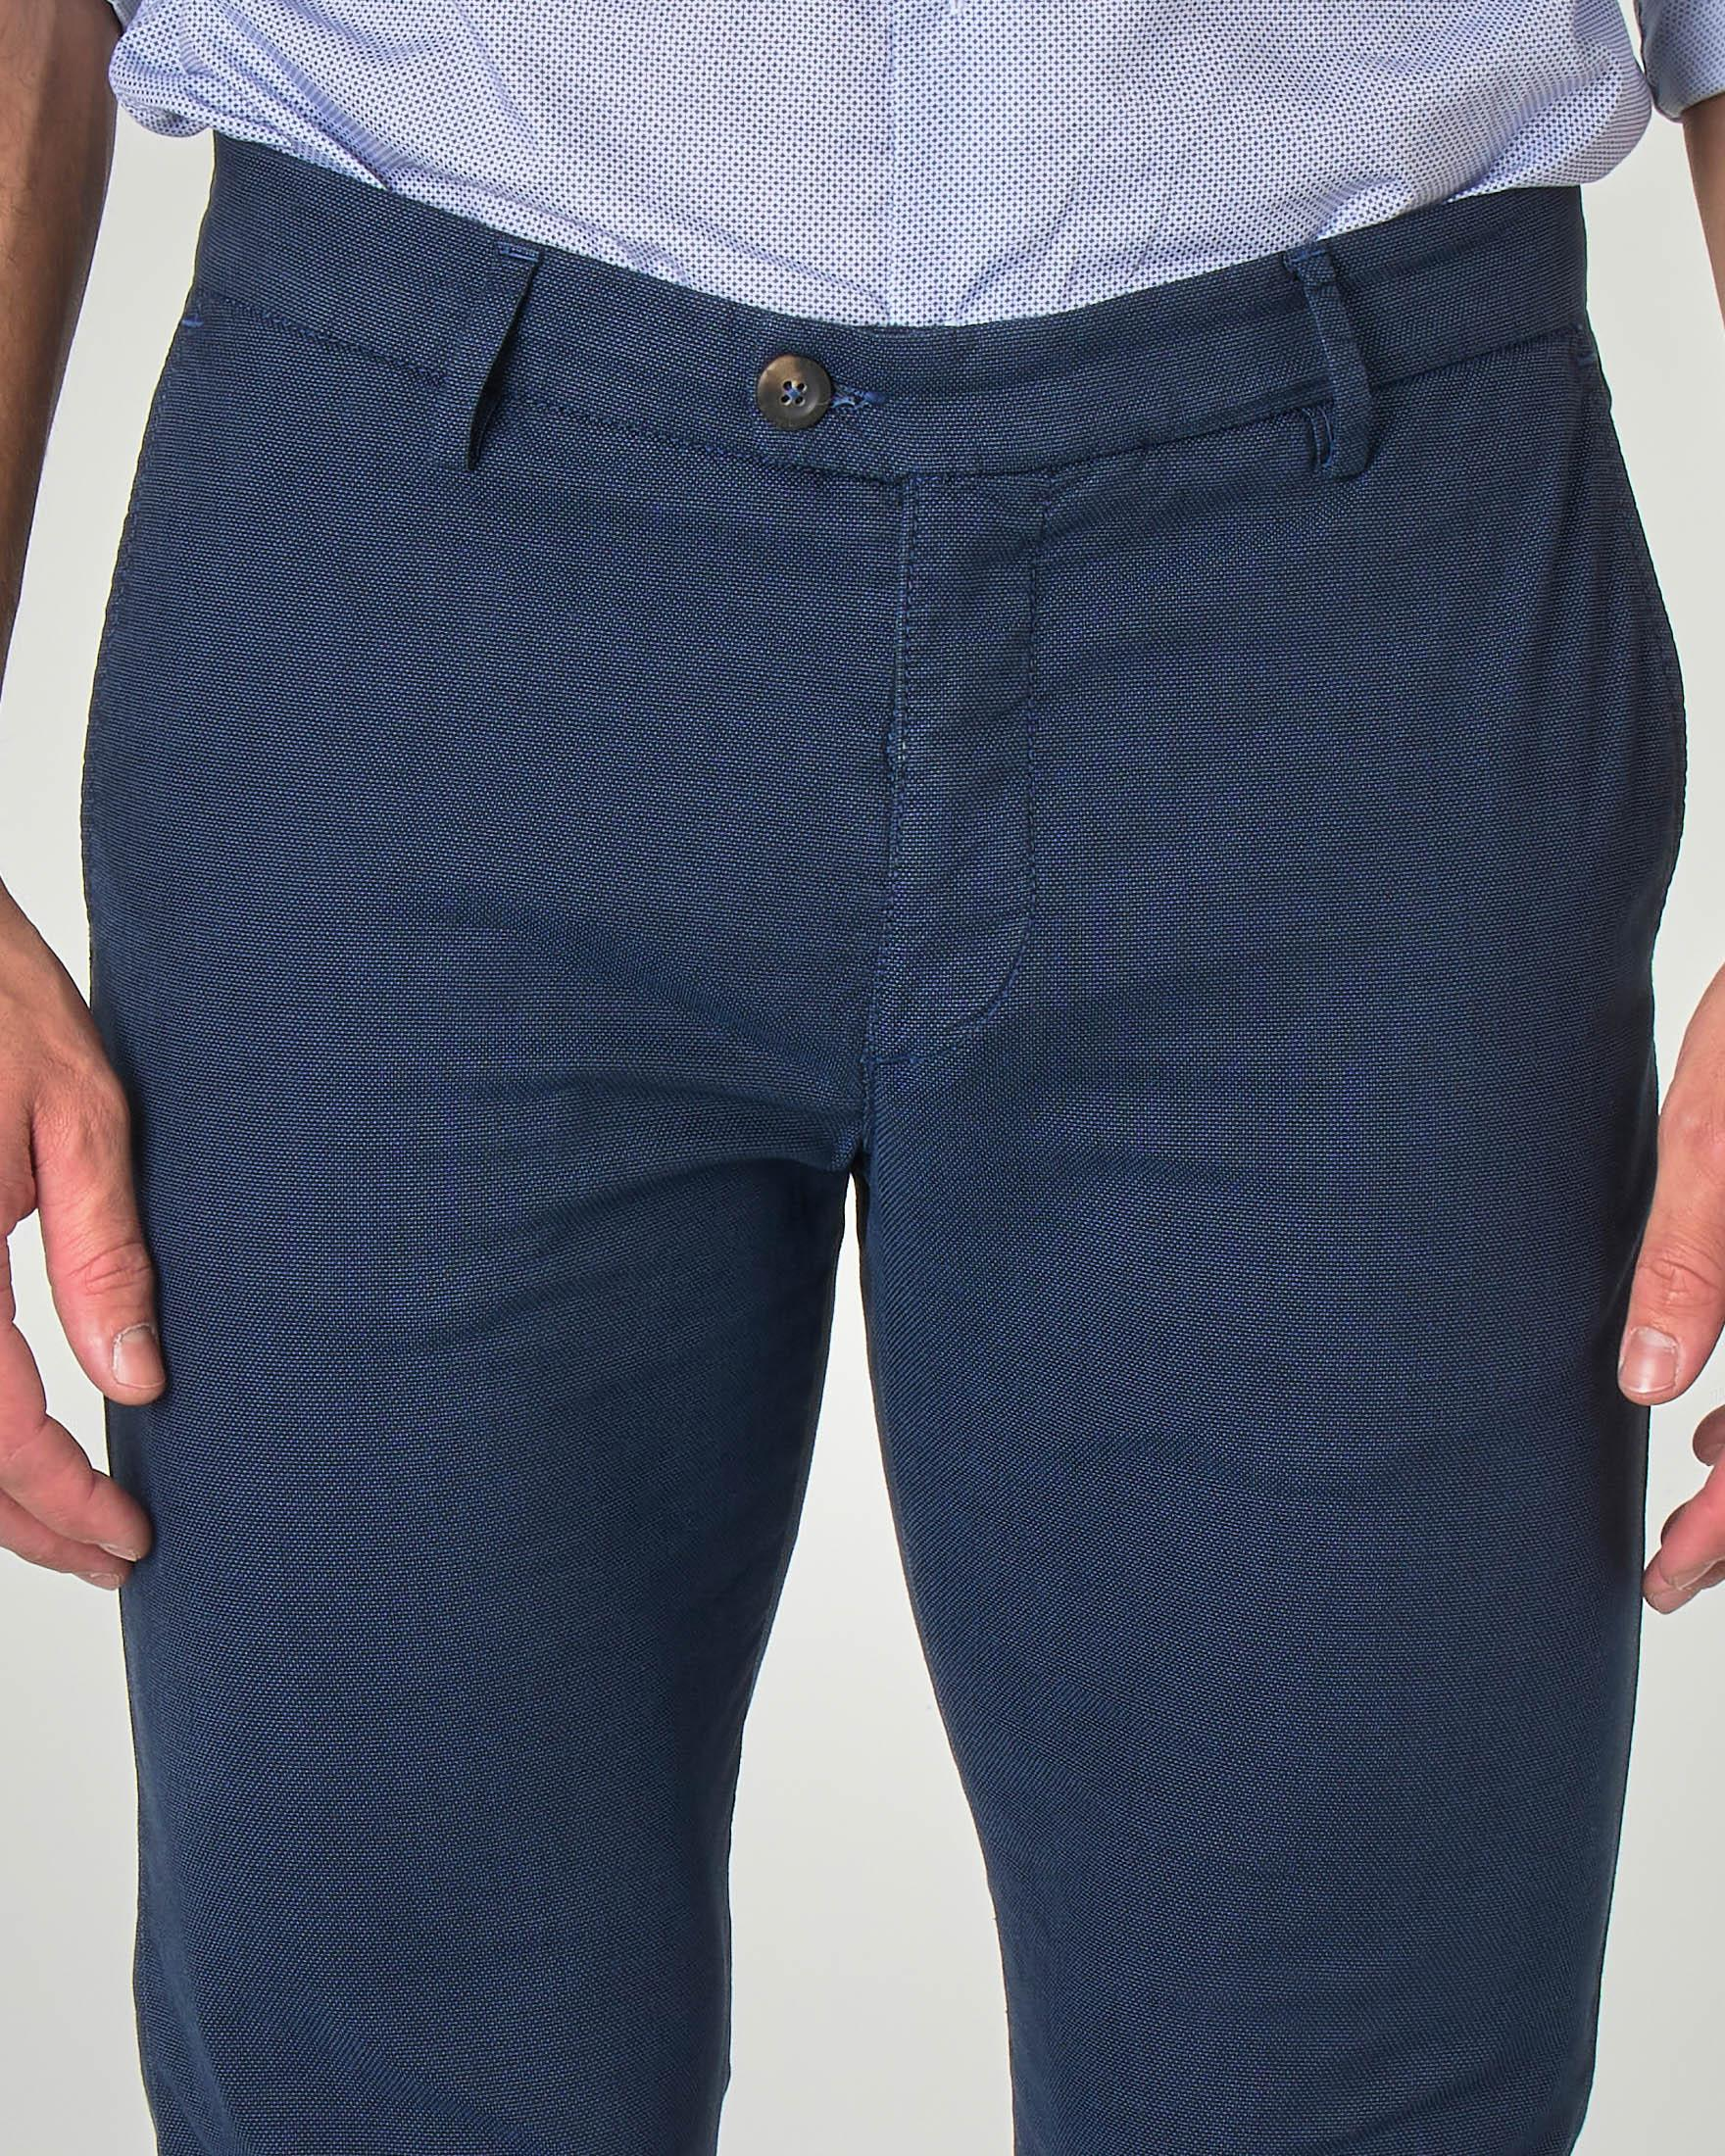 Pantalone chino blu indaco in tessuto puntaspillo stretch